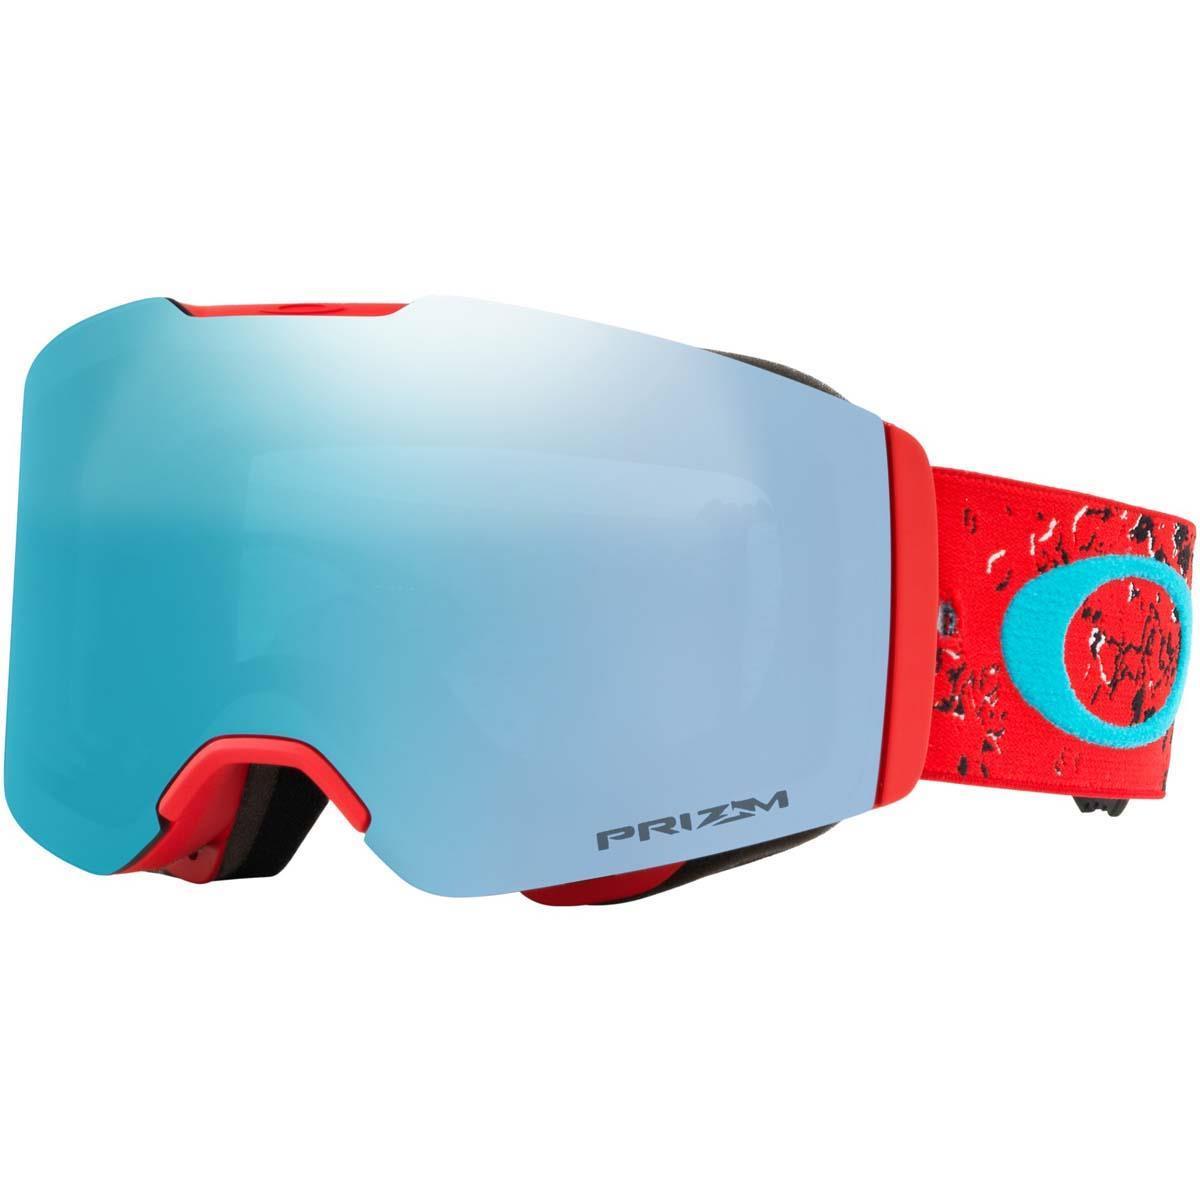 Oakley Prizm Fall Line Ski Snowboard Goggles Buckmans Com